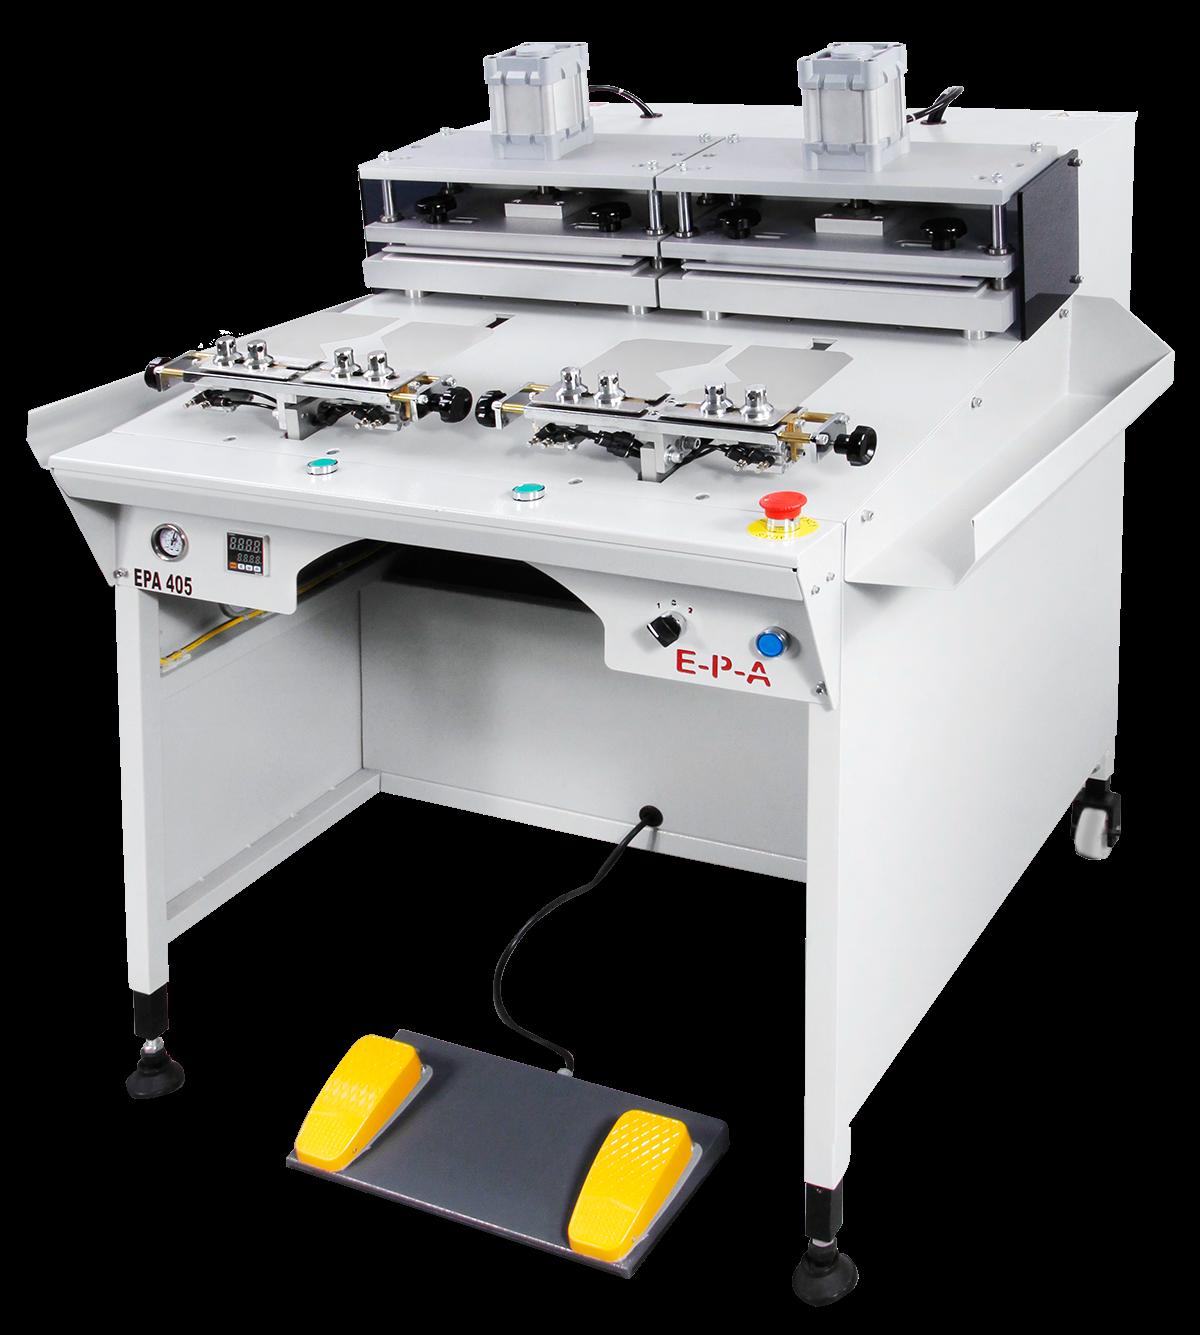 EPA 405 Cuff forming machine